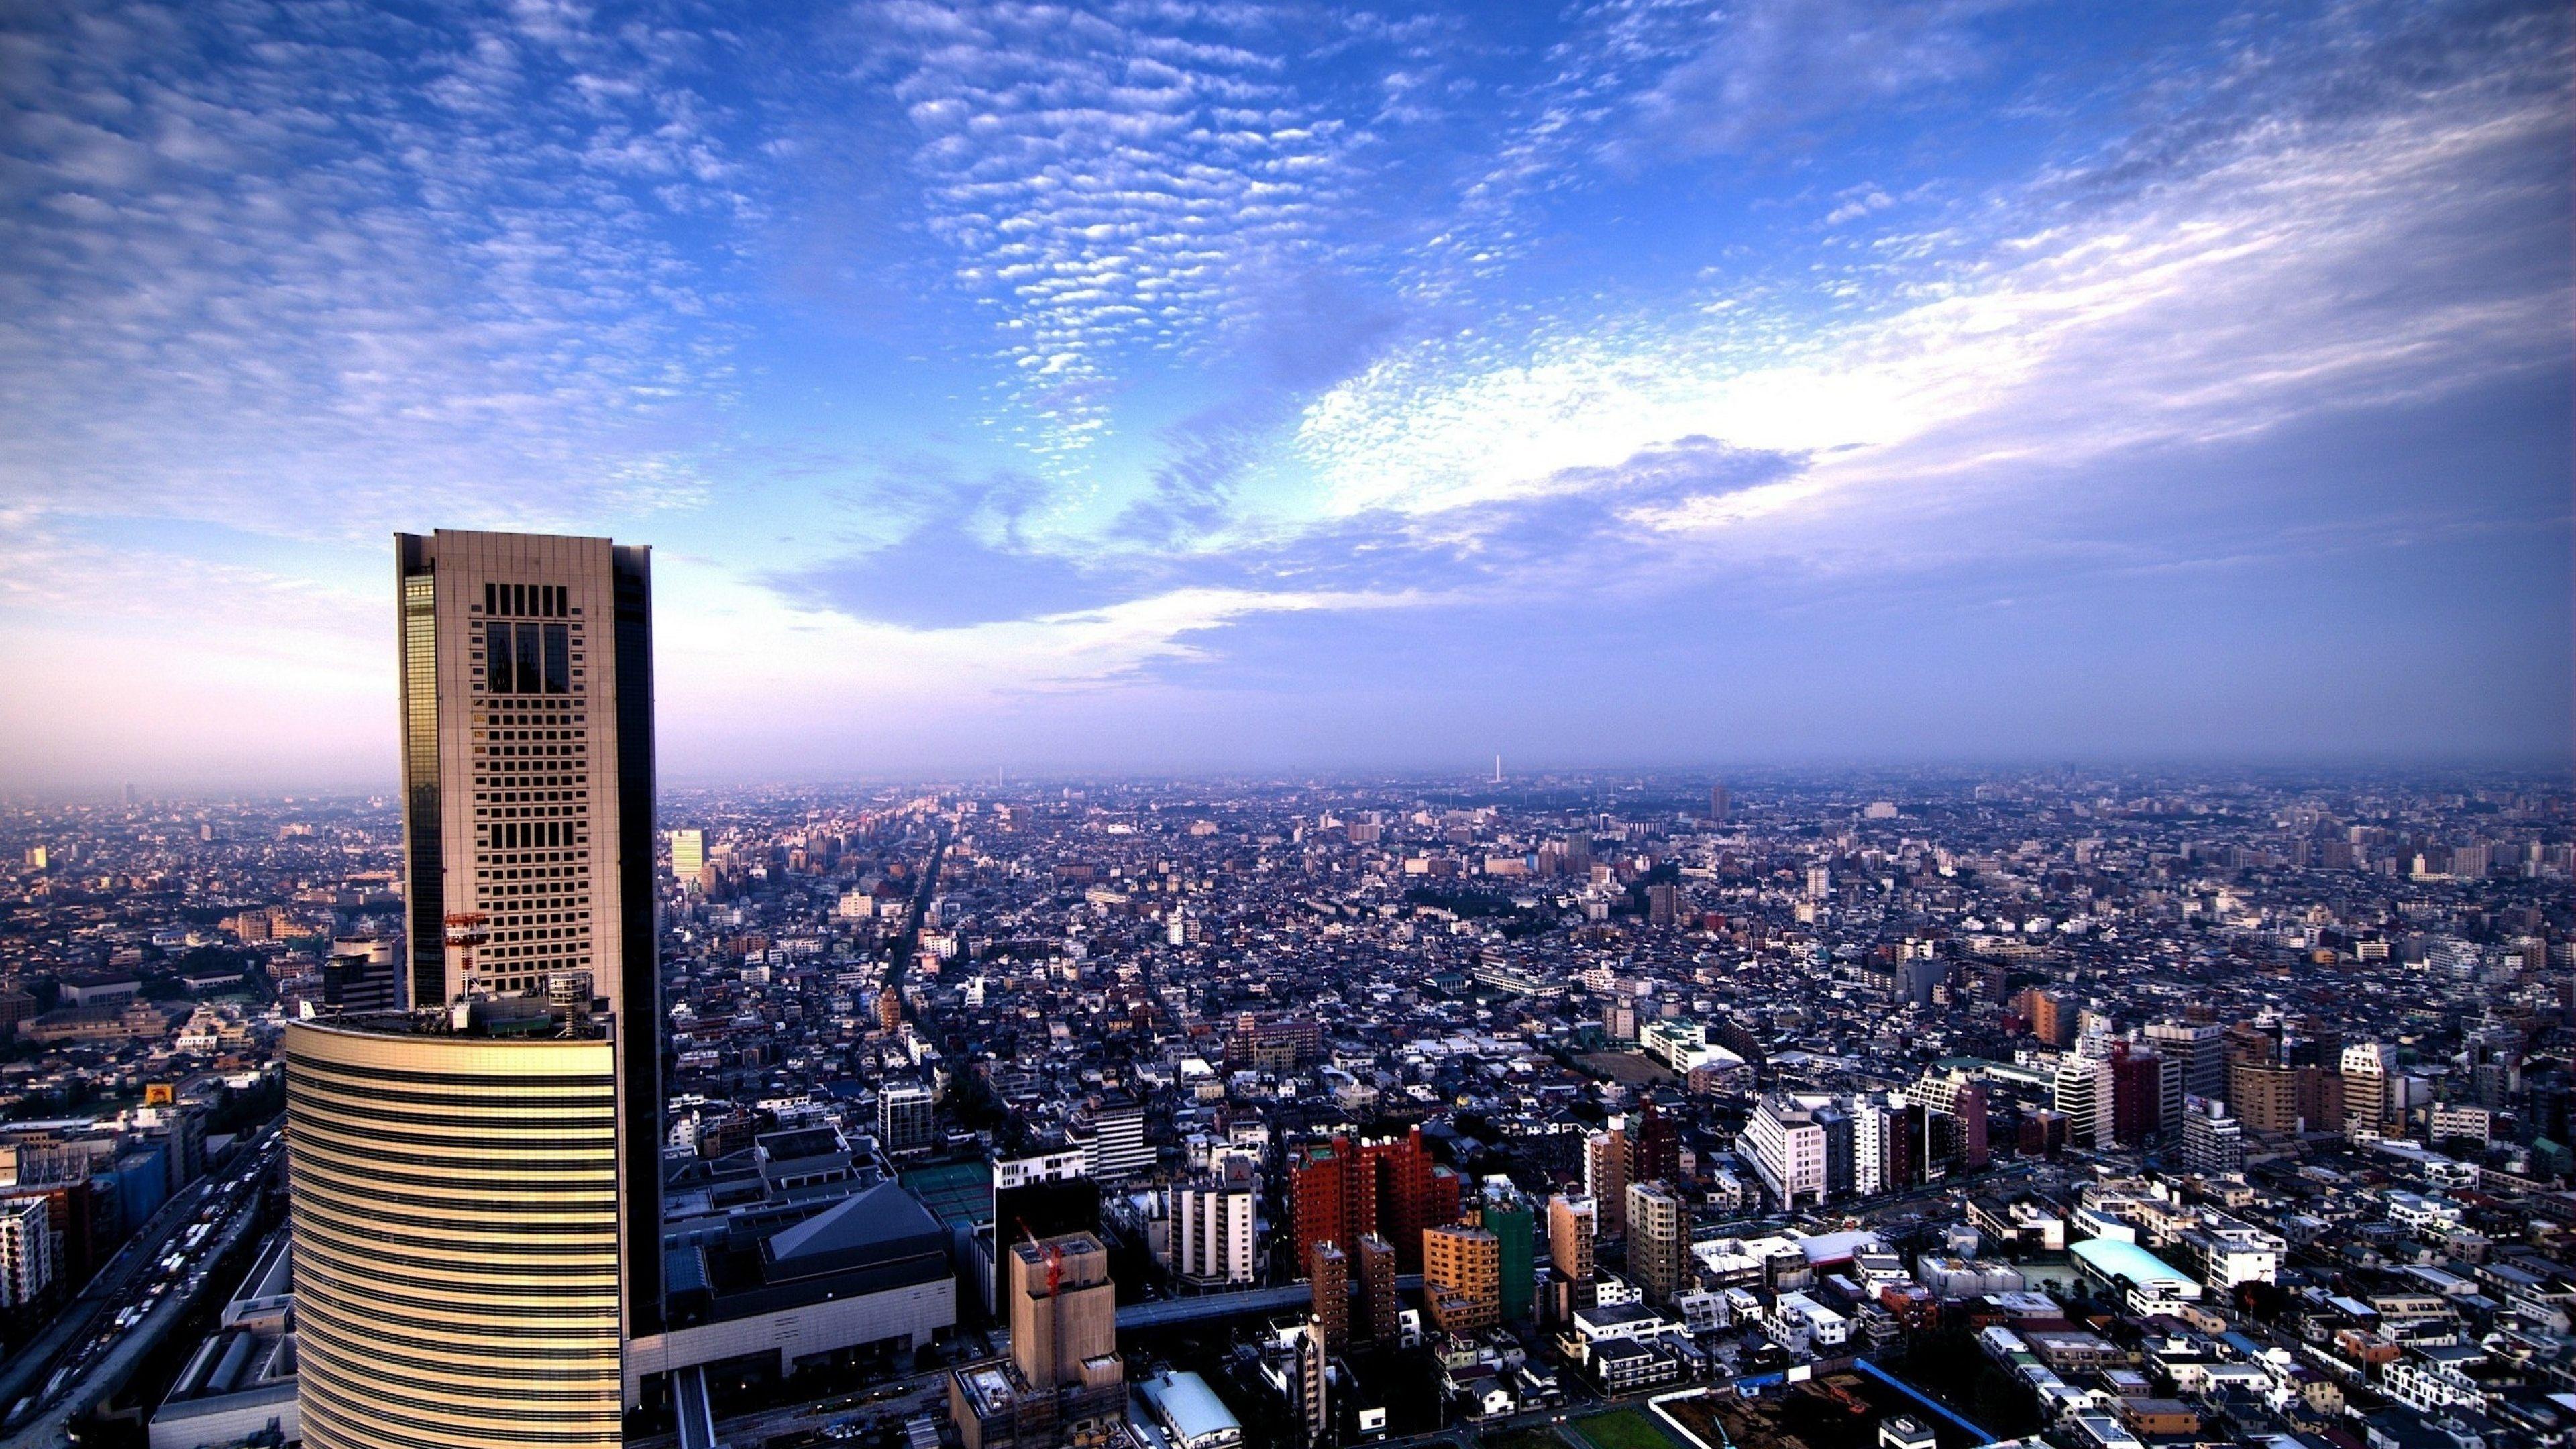 Tokyo City Aerial View 4k Ultra Hd Wallpaper Tokyo City City Wallpaper Detroit City